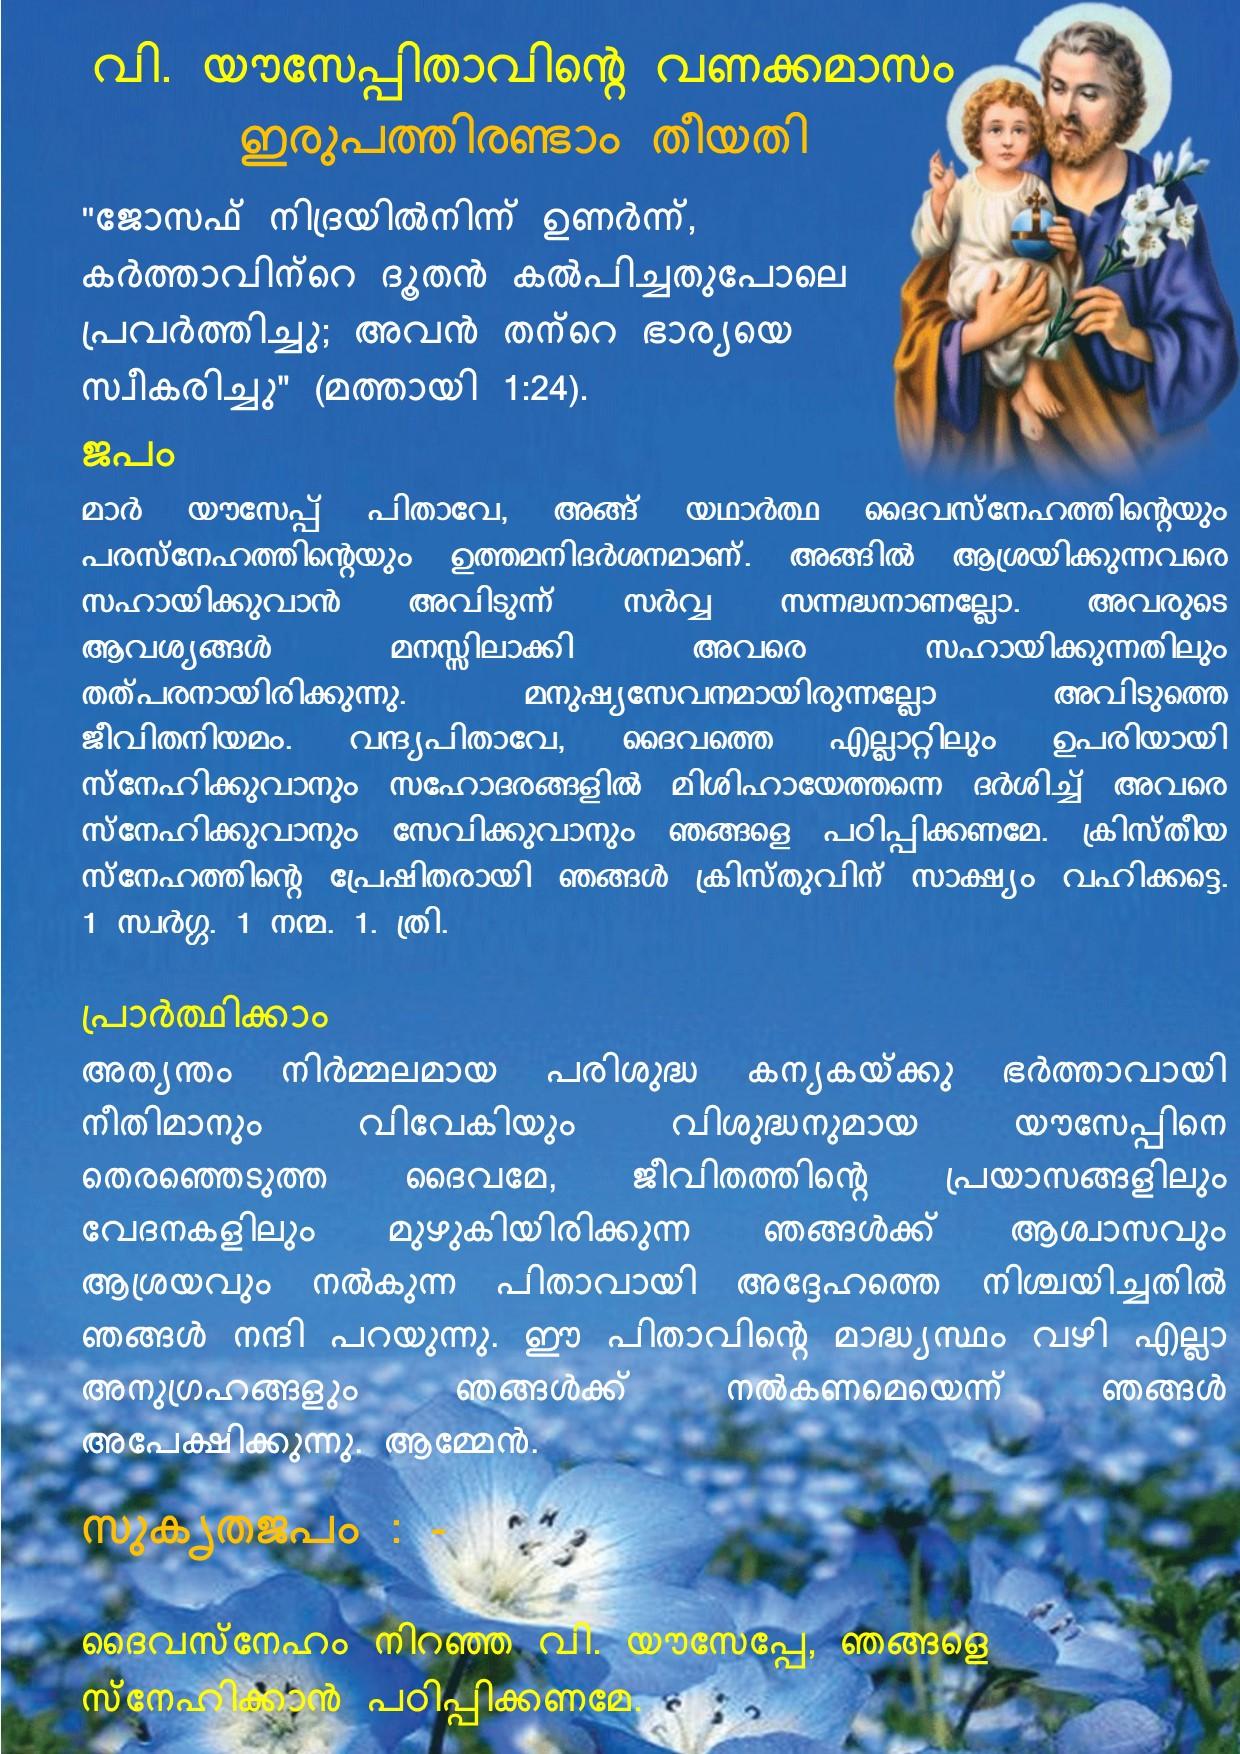 Vanakkamasam, St Joseph, March 22